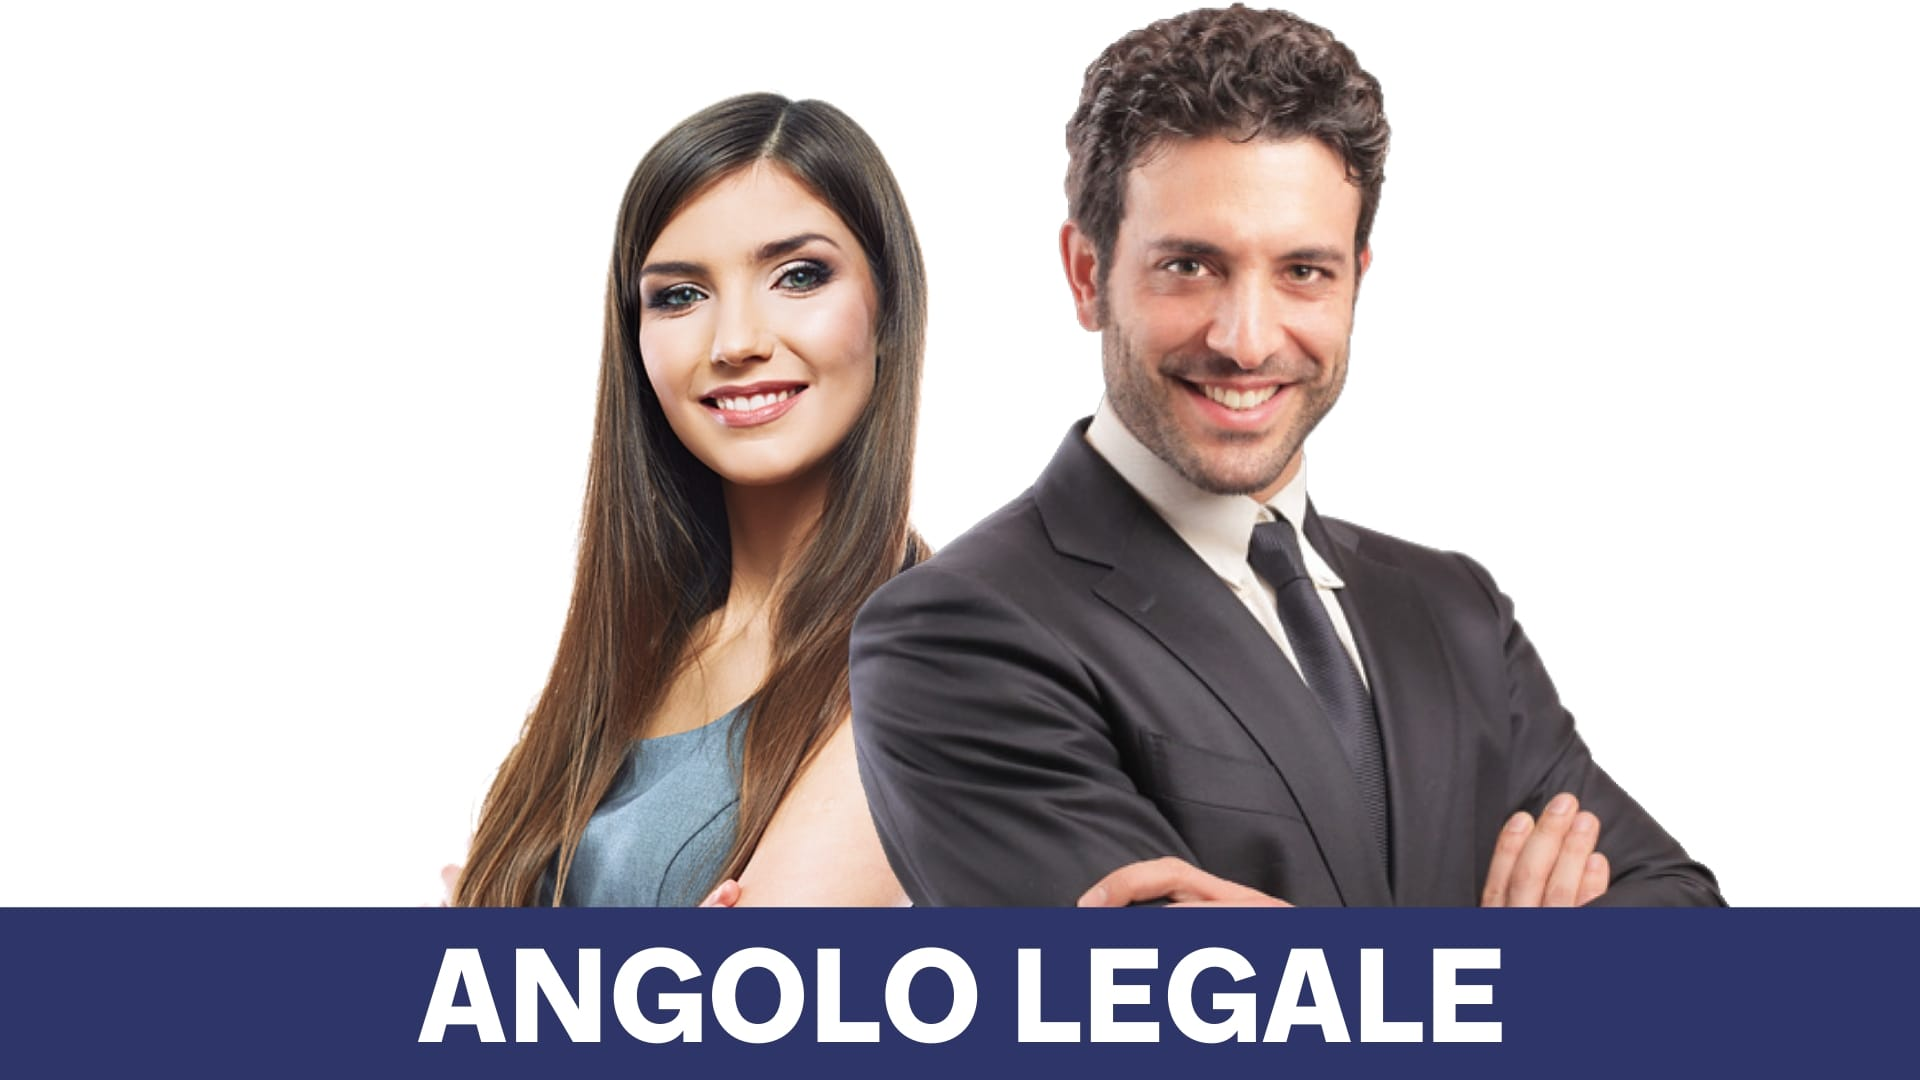 Angolo Legale FIAP